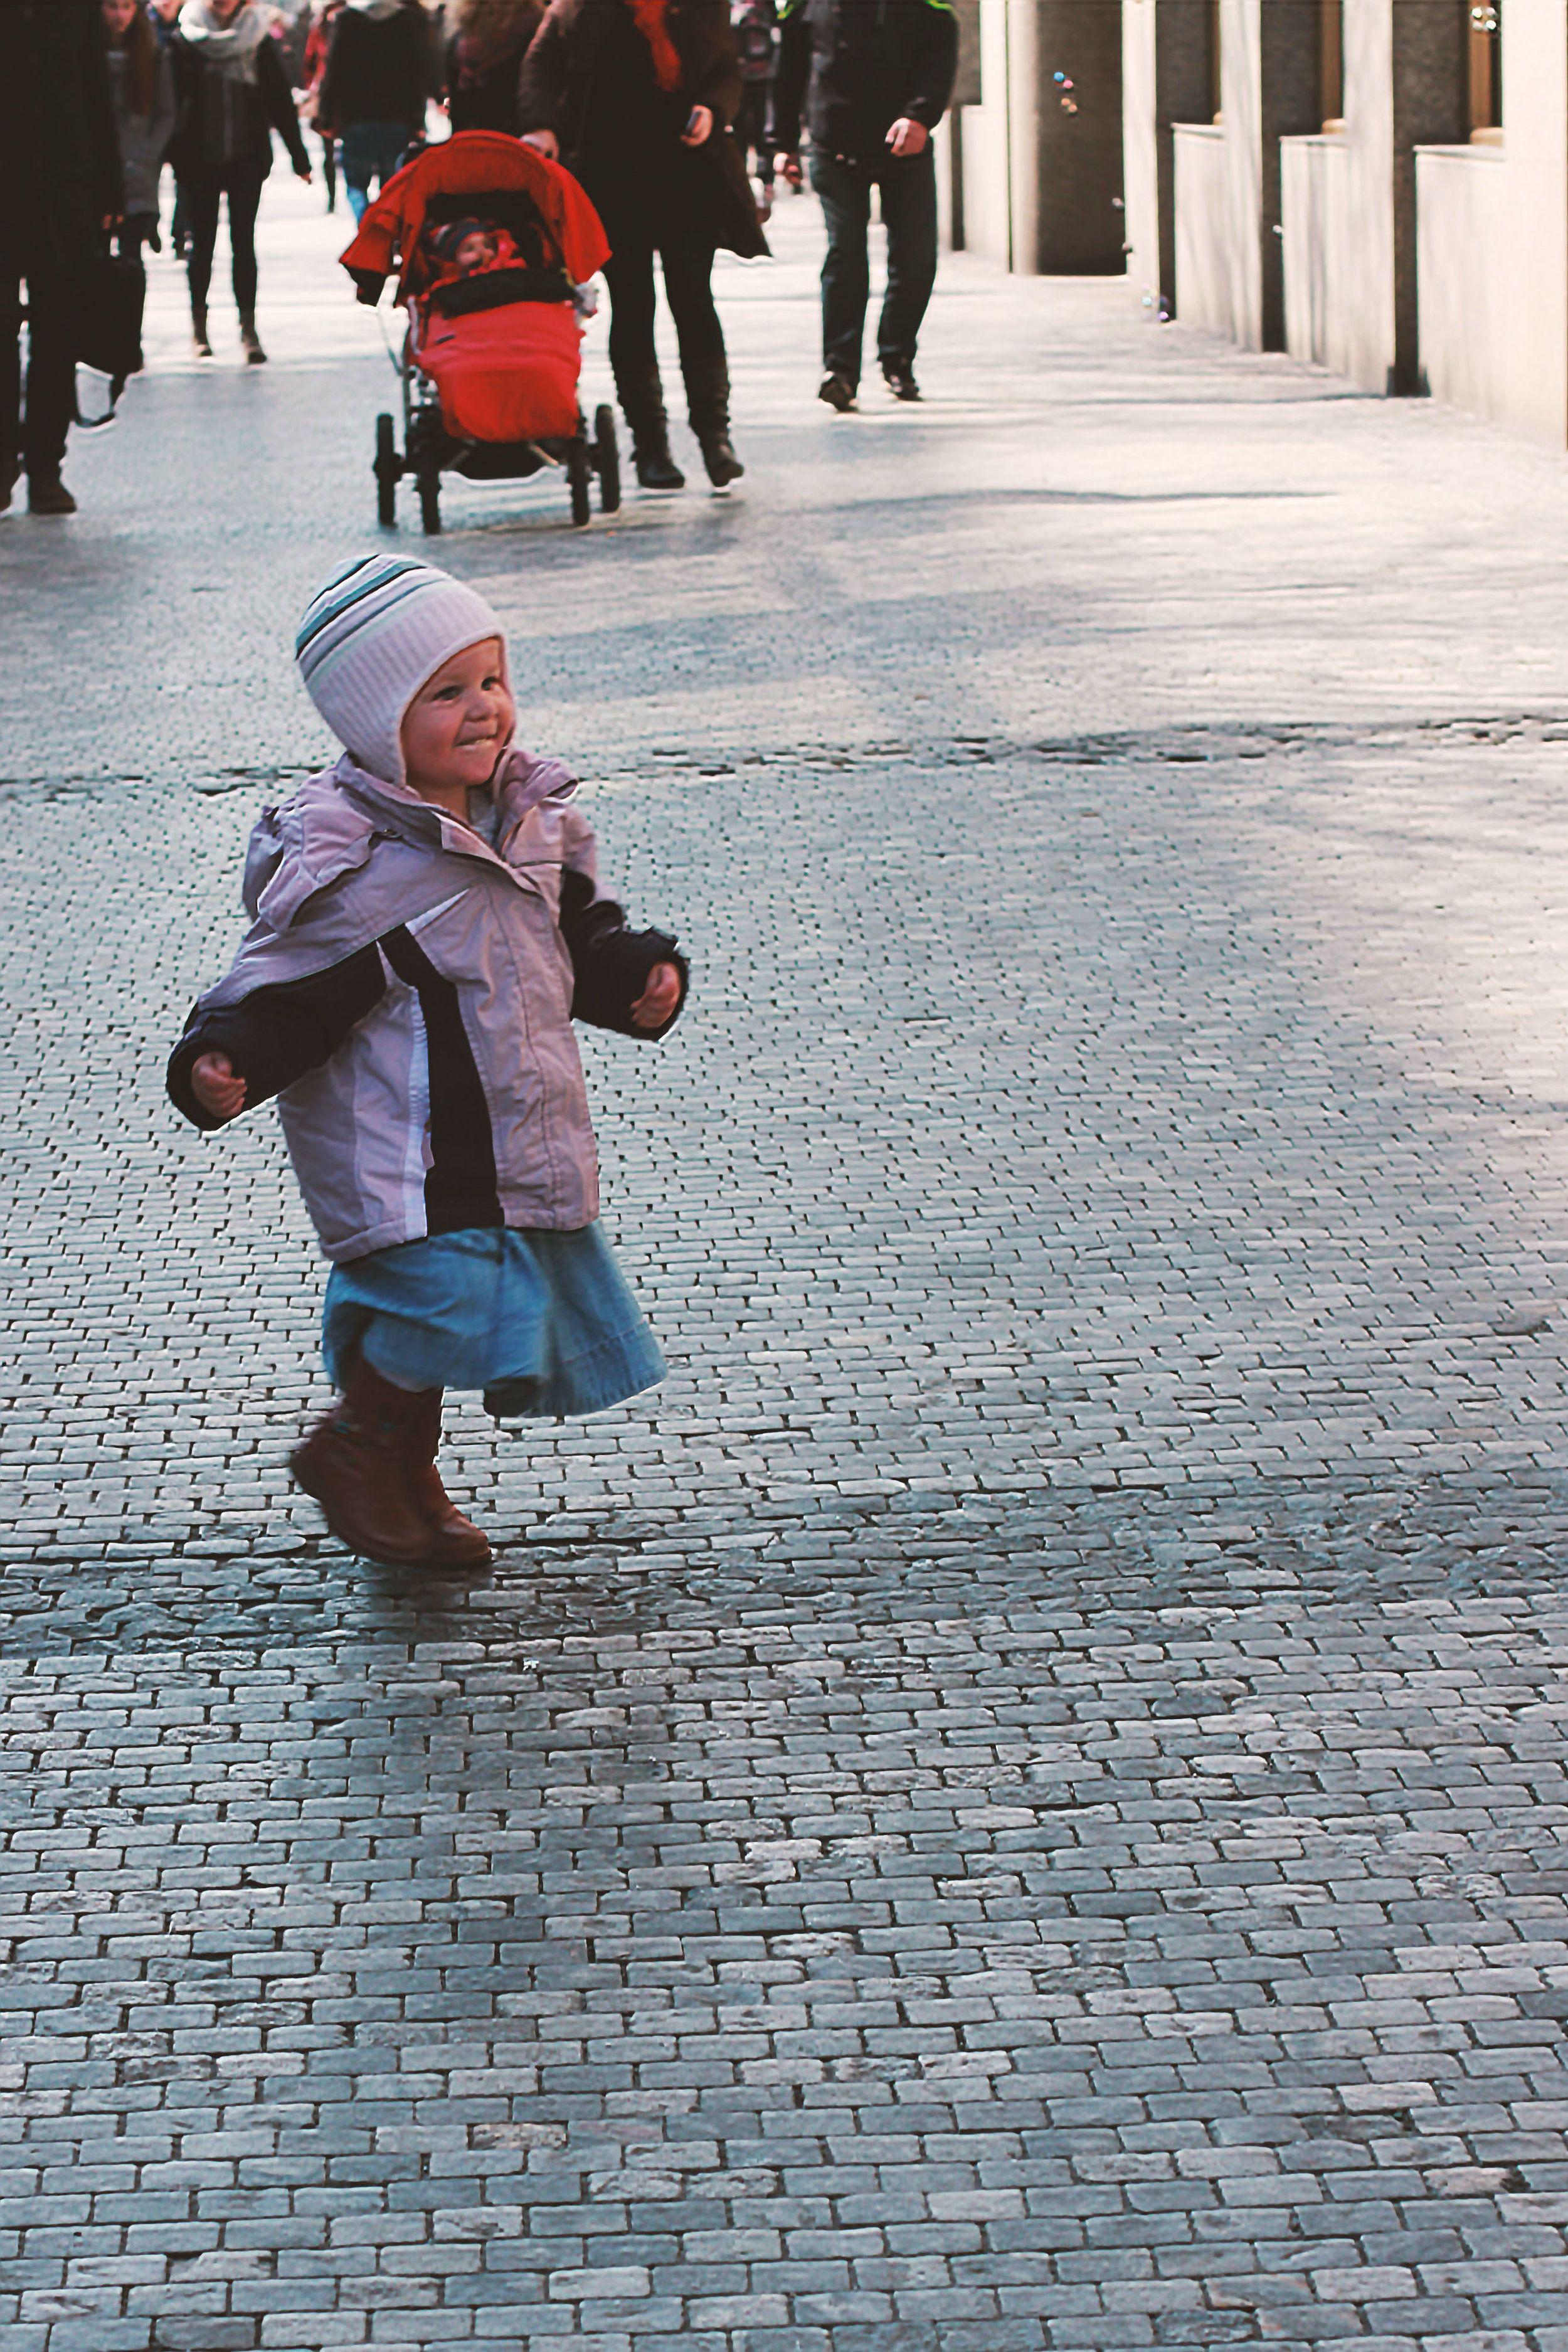 Run baby, run !!!